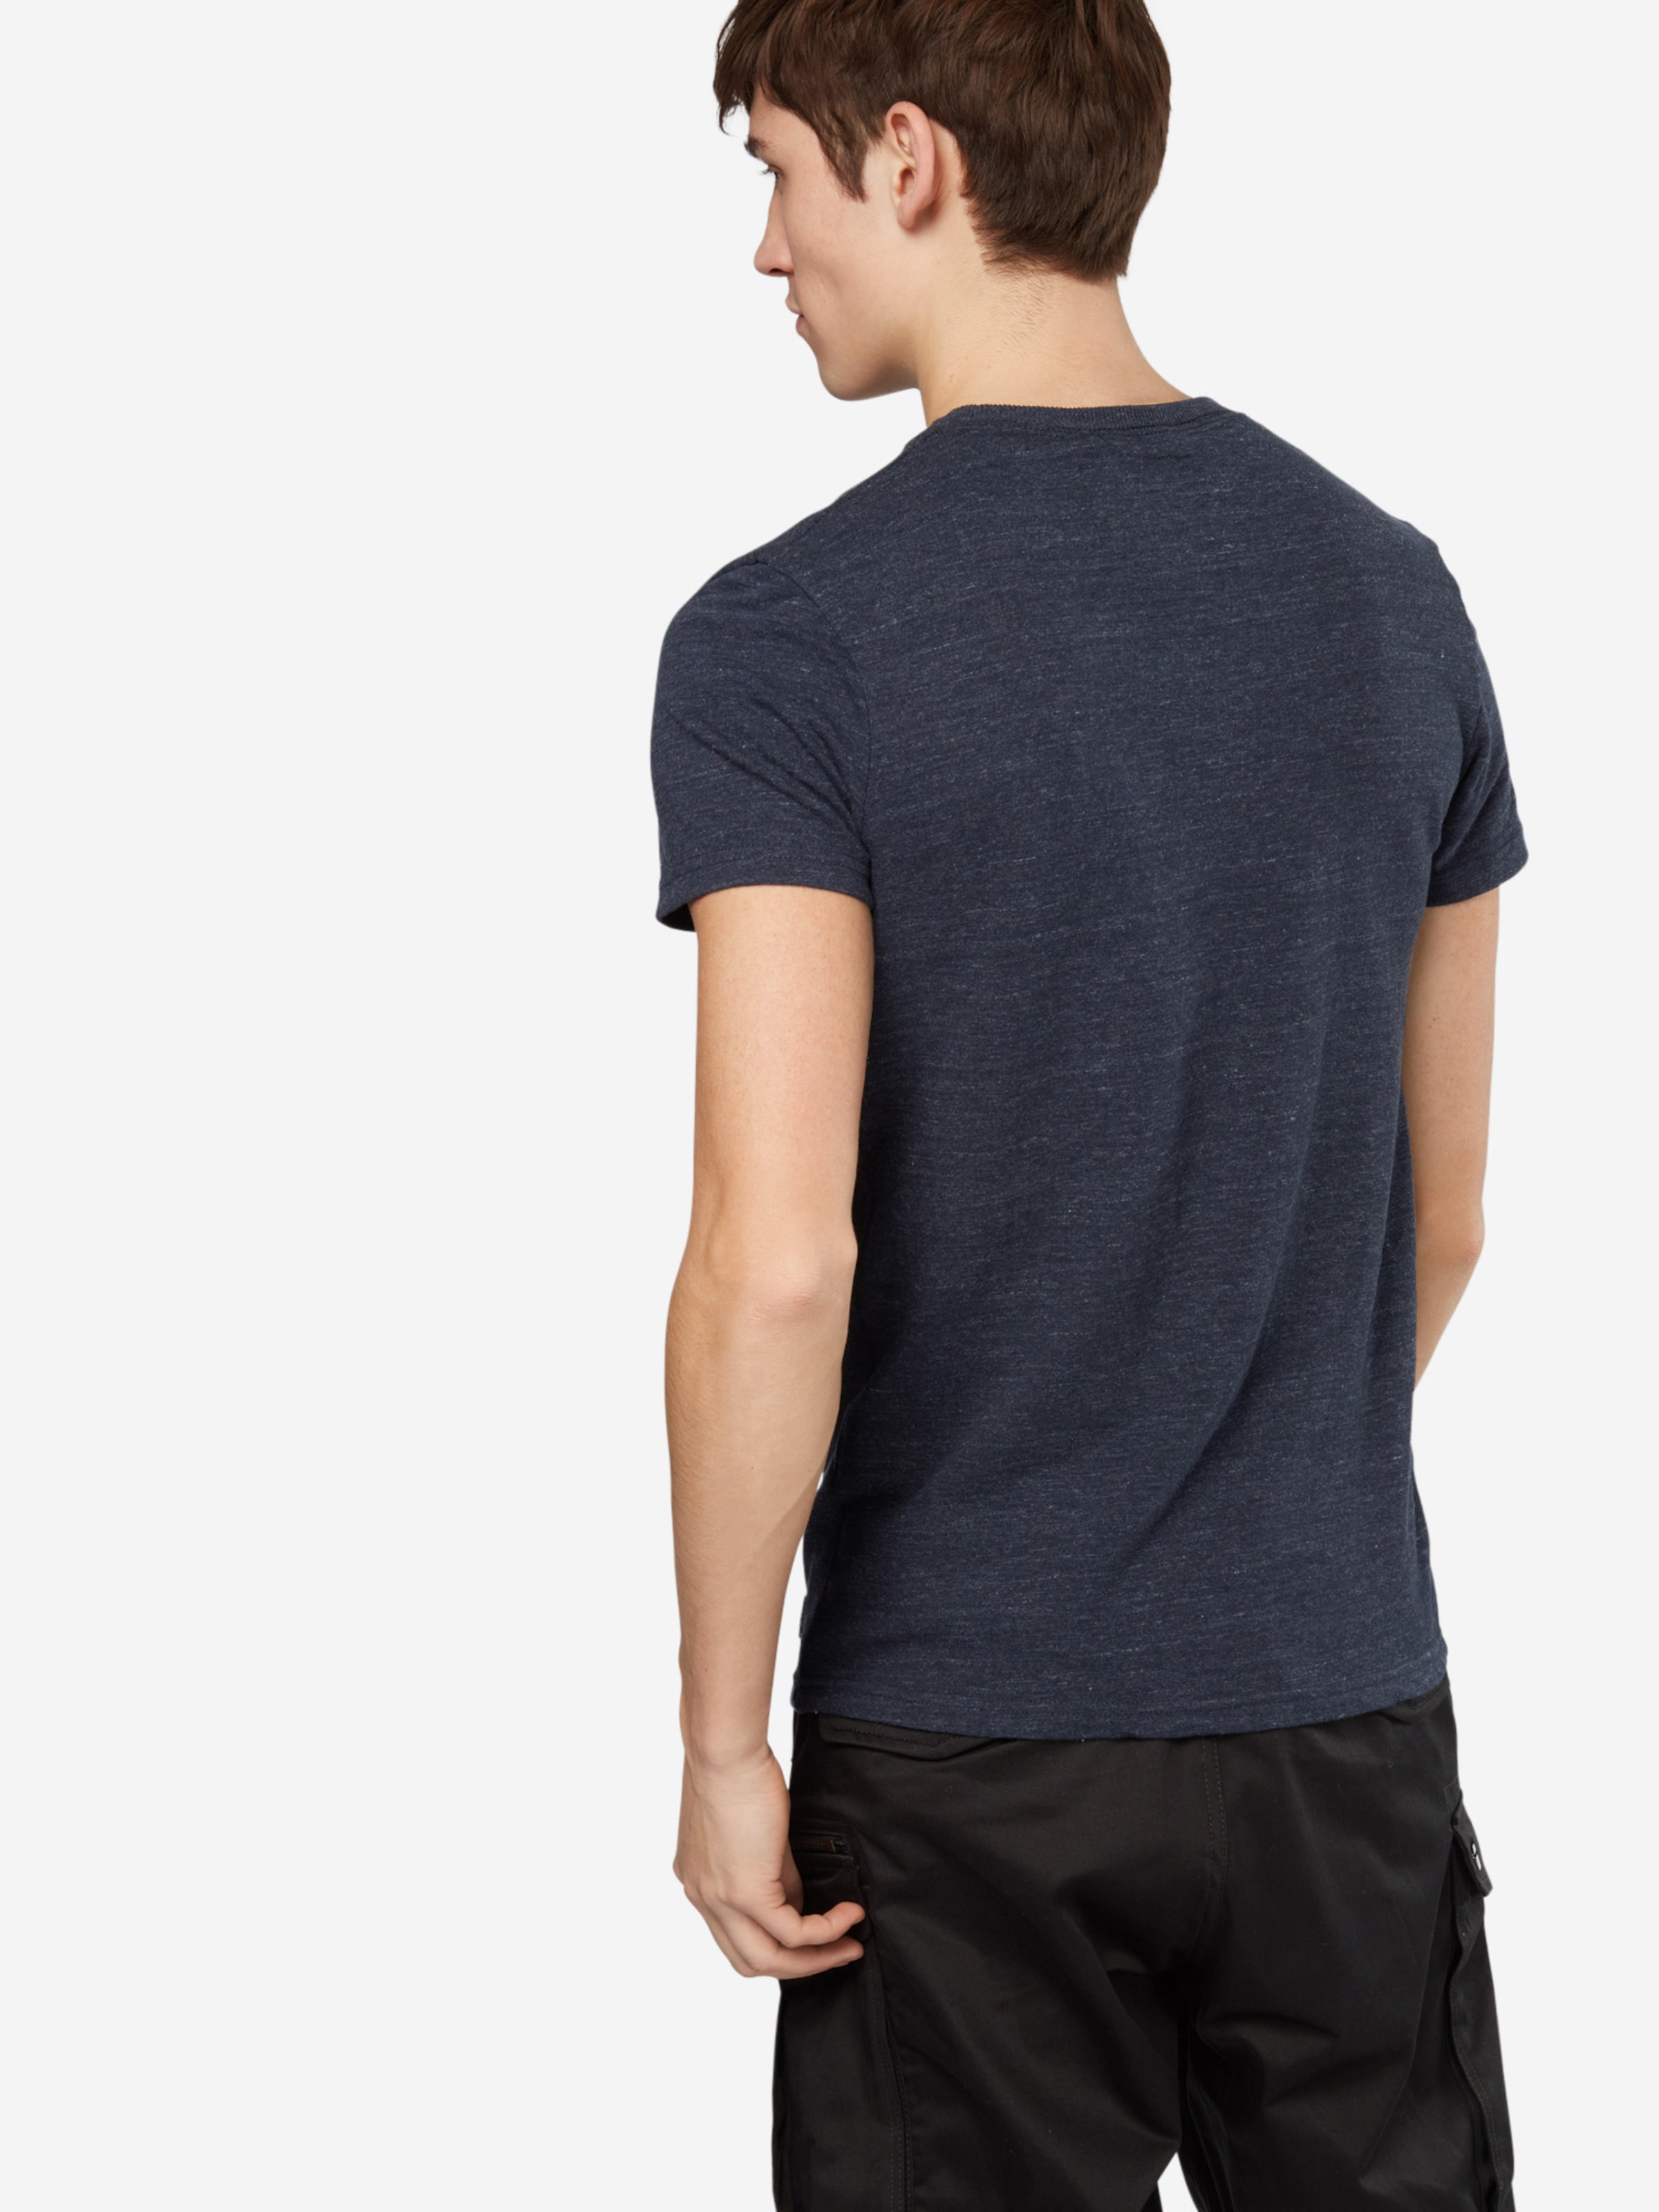 Superdry T-Shirt 'REAL TRADEMARK' Footlocker Bilder Verkauf Online Für Billig Günstig Online Mit Paypal Günstig Online Auslass Zum Verkauf Outlet Rabatt Verkauf 4sIIder4C